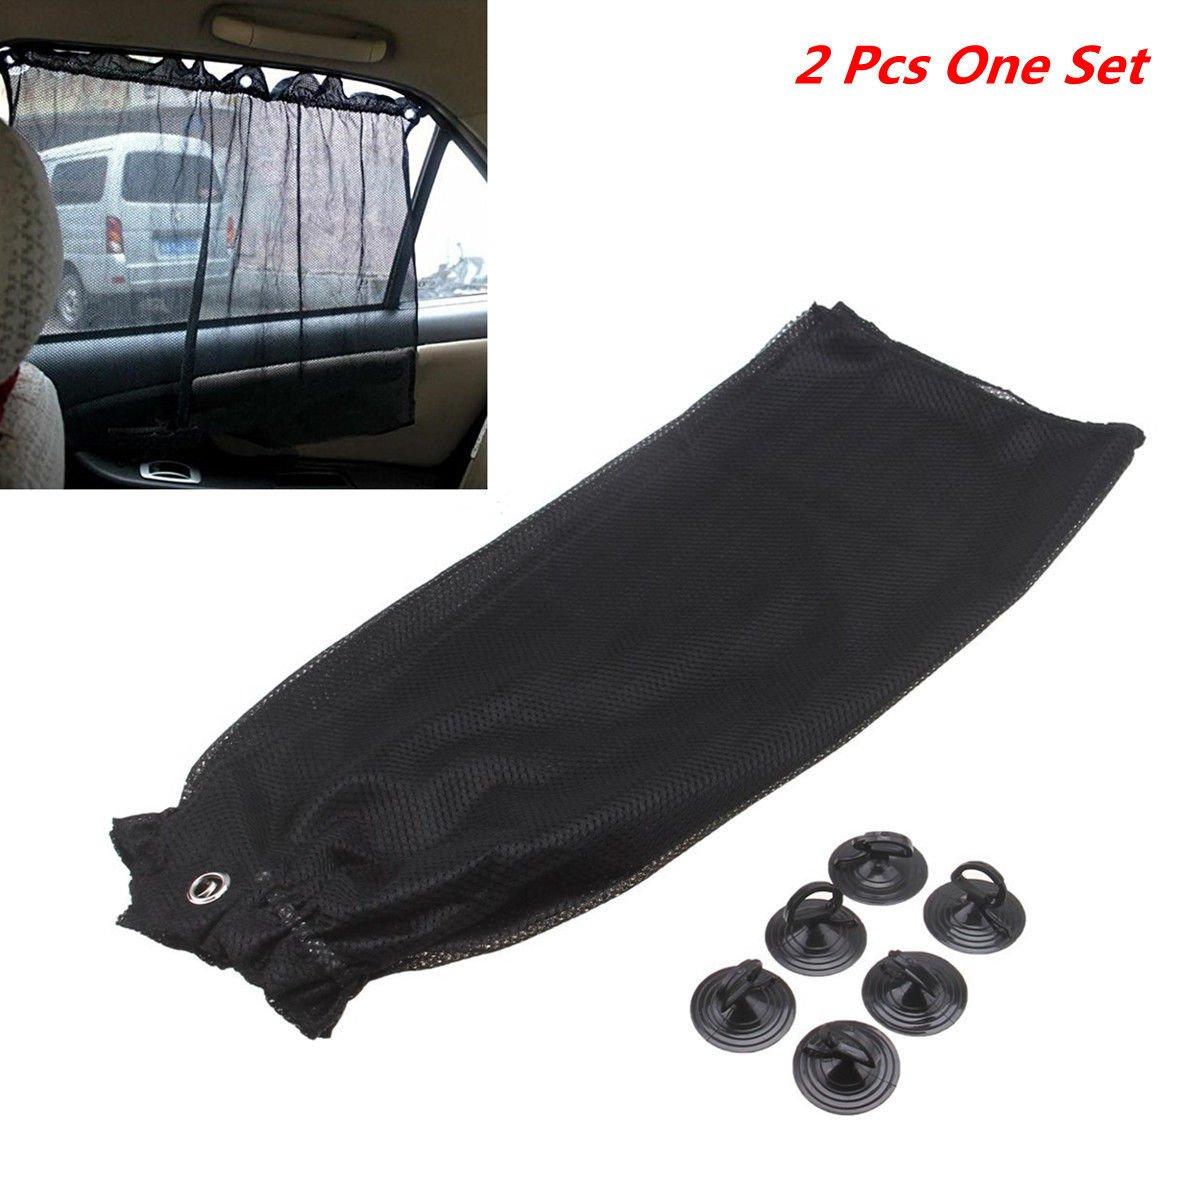 MAZIMARK--2pc Car Sun Shade Curtain UV Protection Side Window Visor Curtain W/ Suction Cup